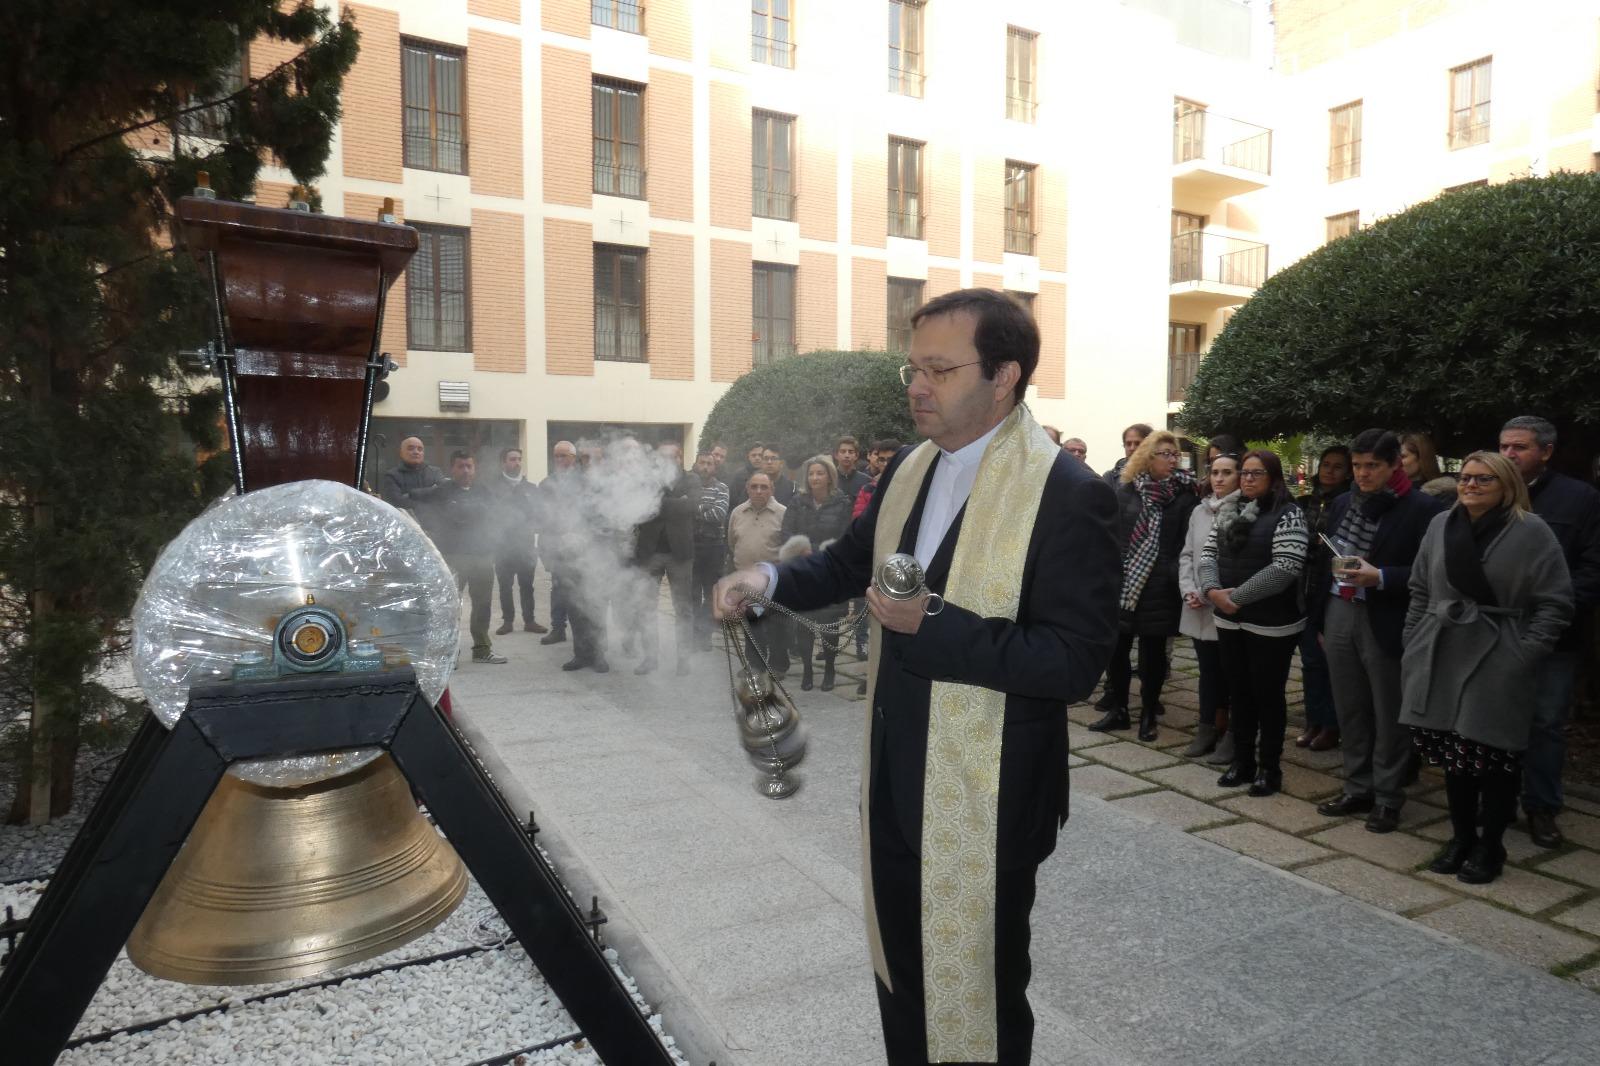 bendición campanas 2